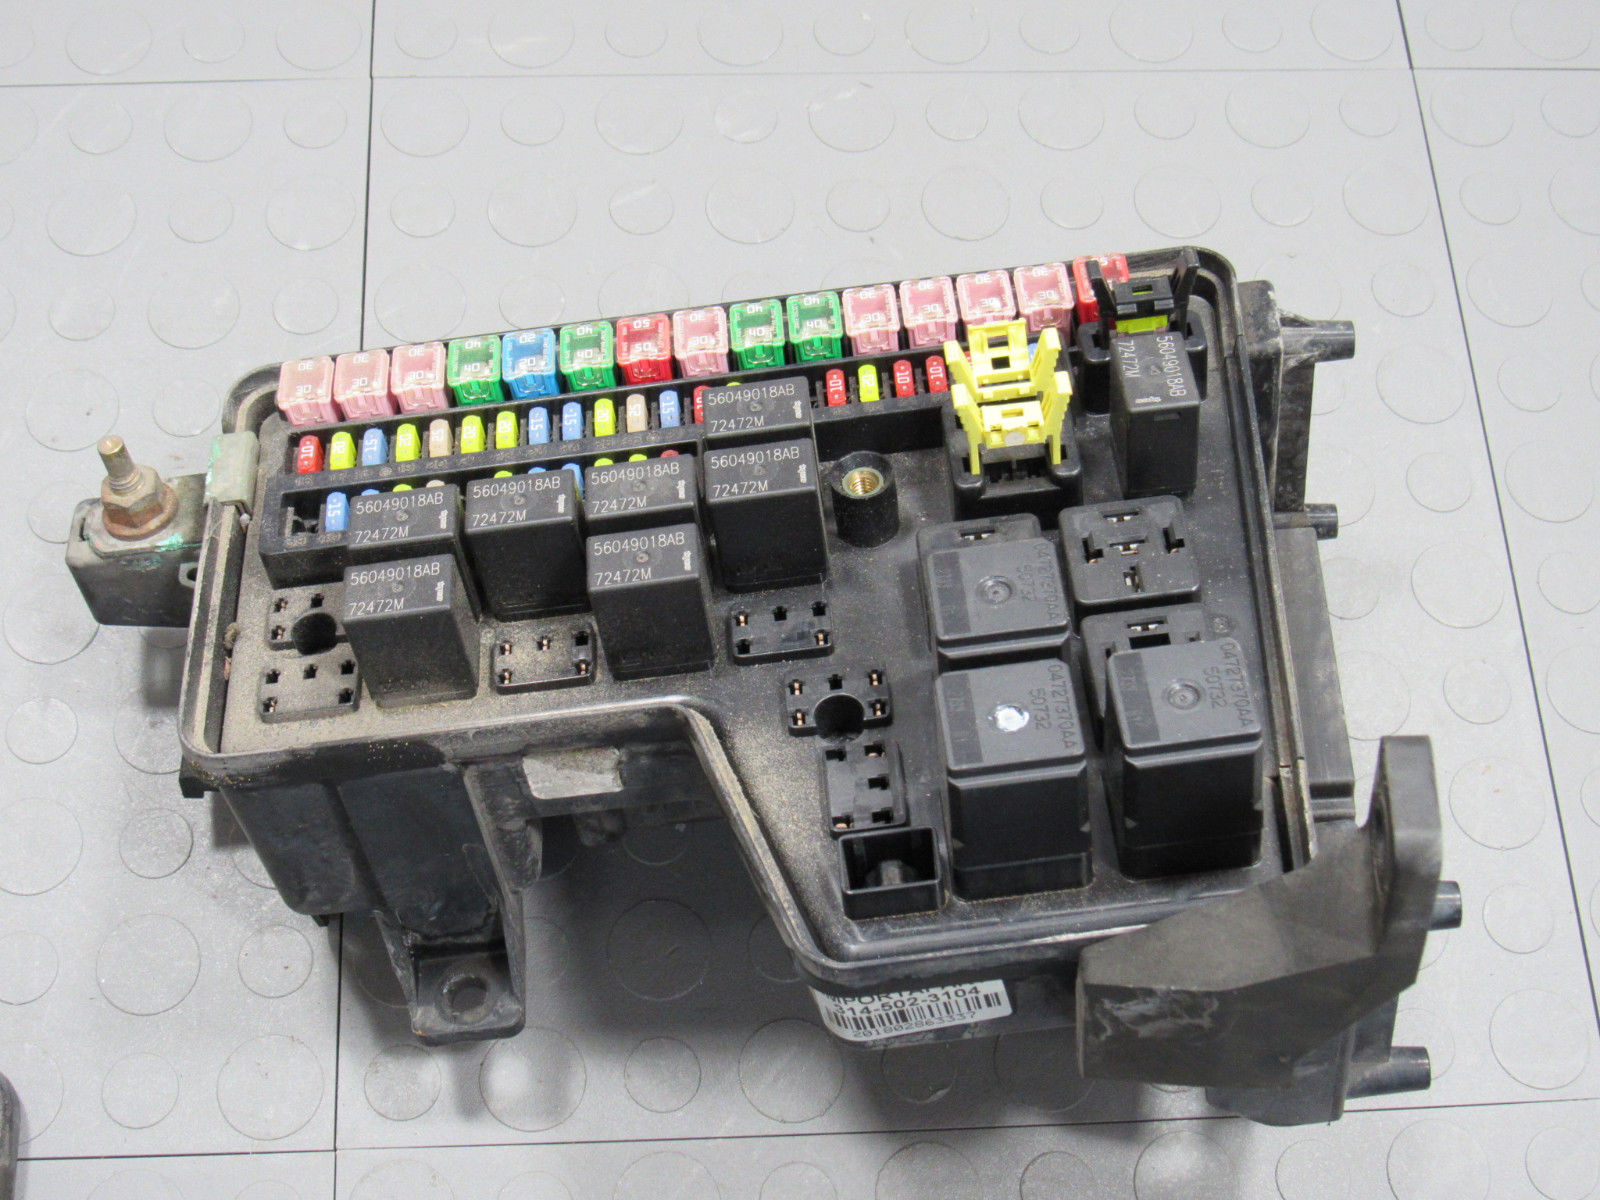 03 05 Dodge Ram Truck Ipm Integrated Power Module Fuse Block Box 56051039ad Eu